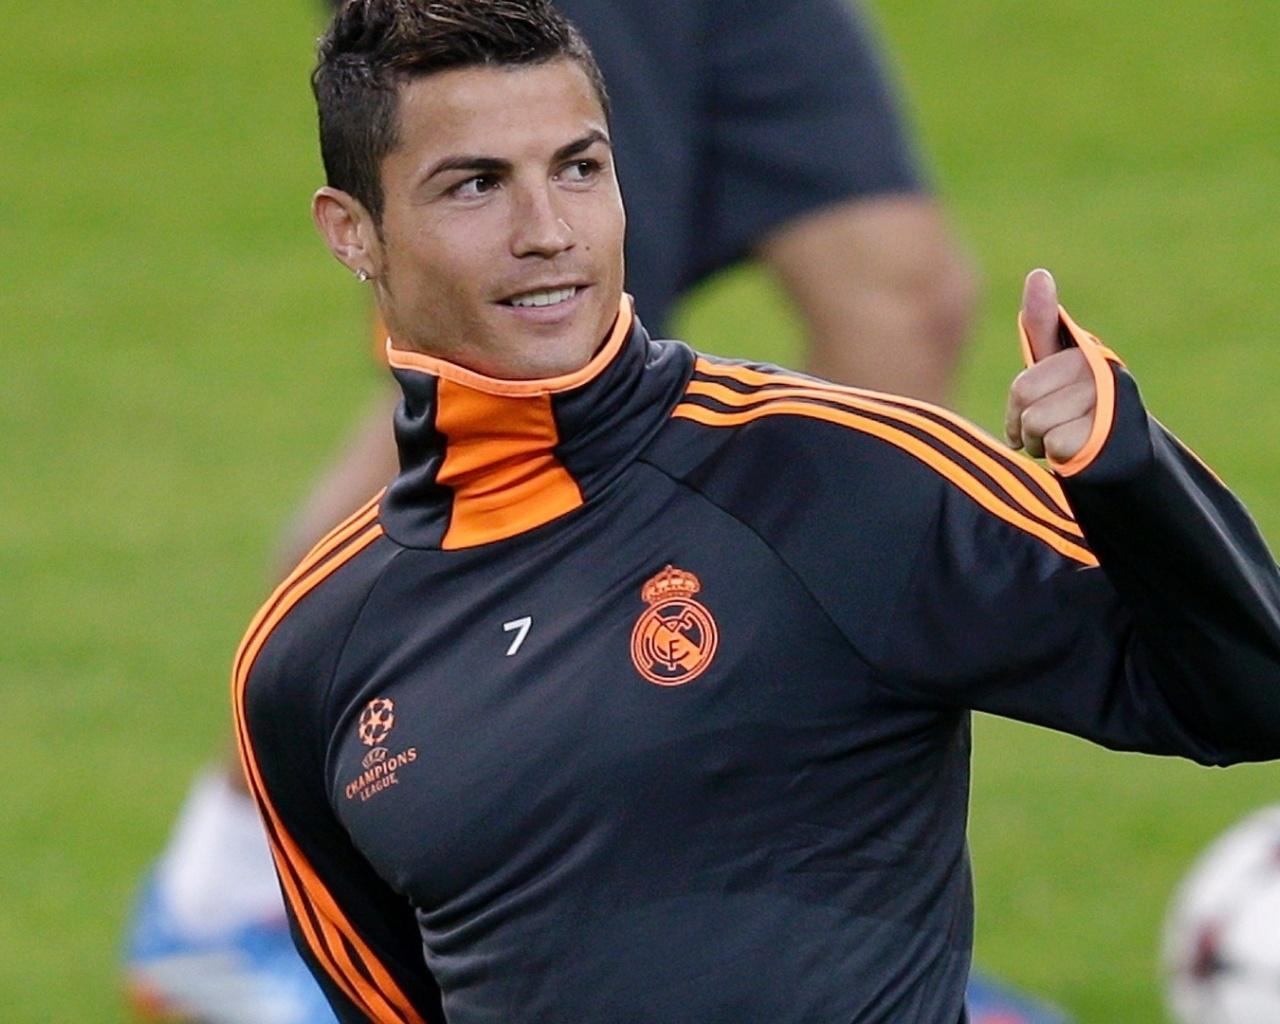 HD Wallpapers Ronaldo